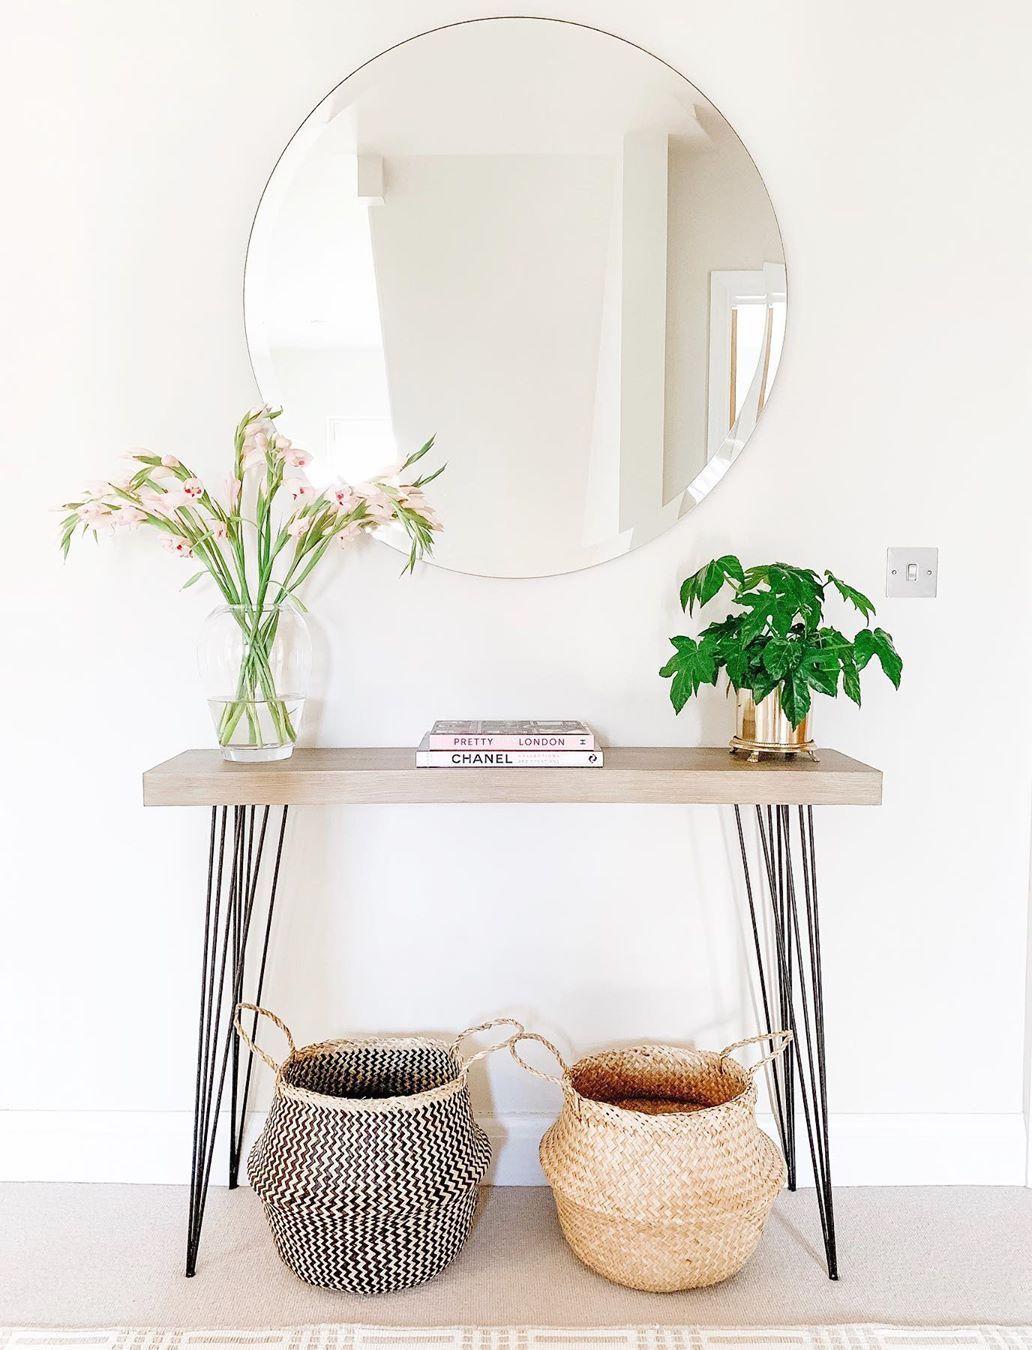 15 Minimalist Scandinavian Console Tables In 2020 Scandinavian Console Tables Home Decor Decor